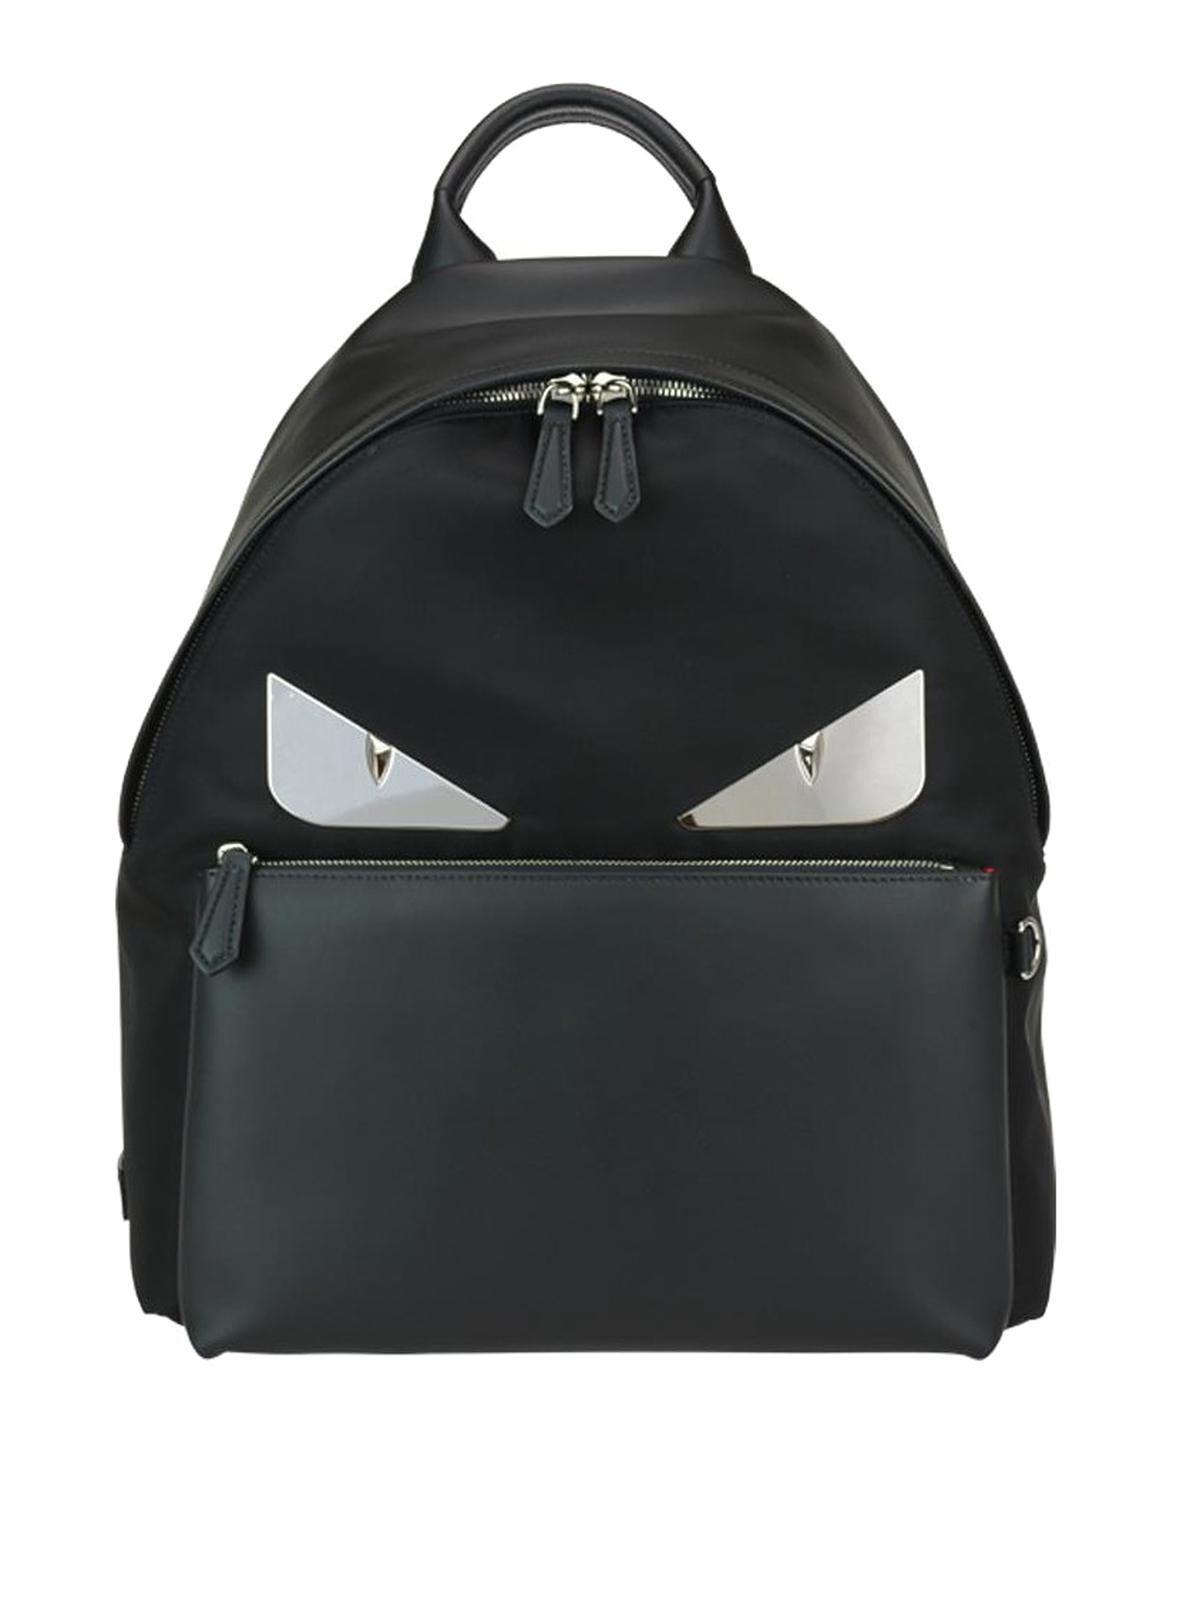 Fendi - Bag Bugs nylon and leather backpack - backpacks ... 528d5453962e4